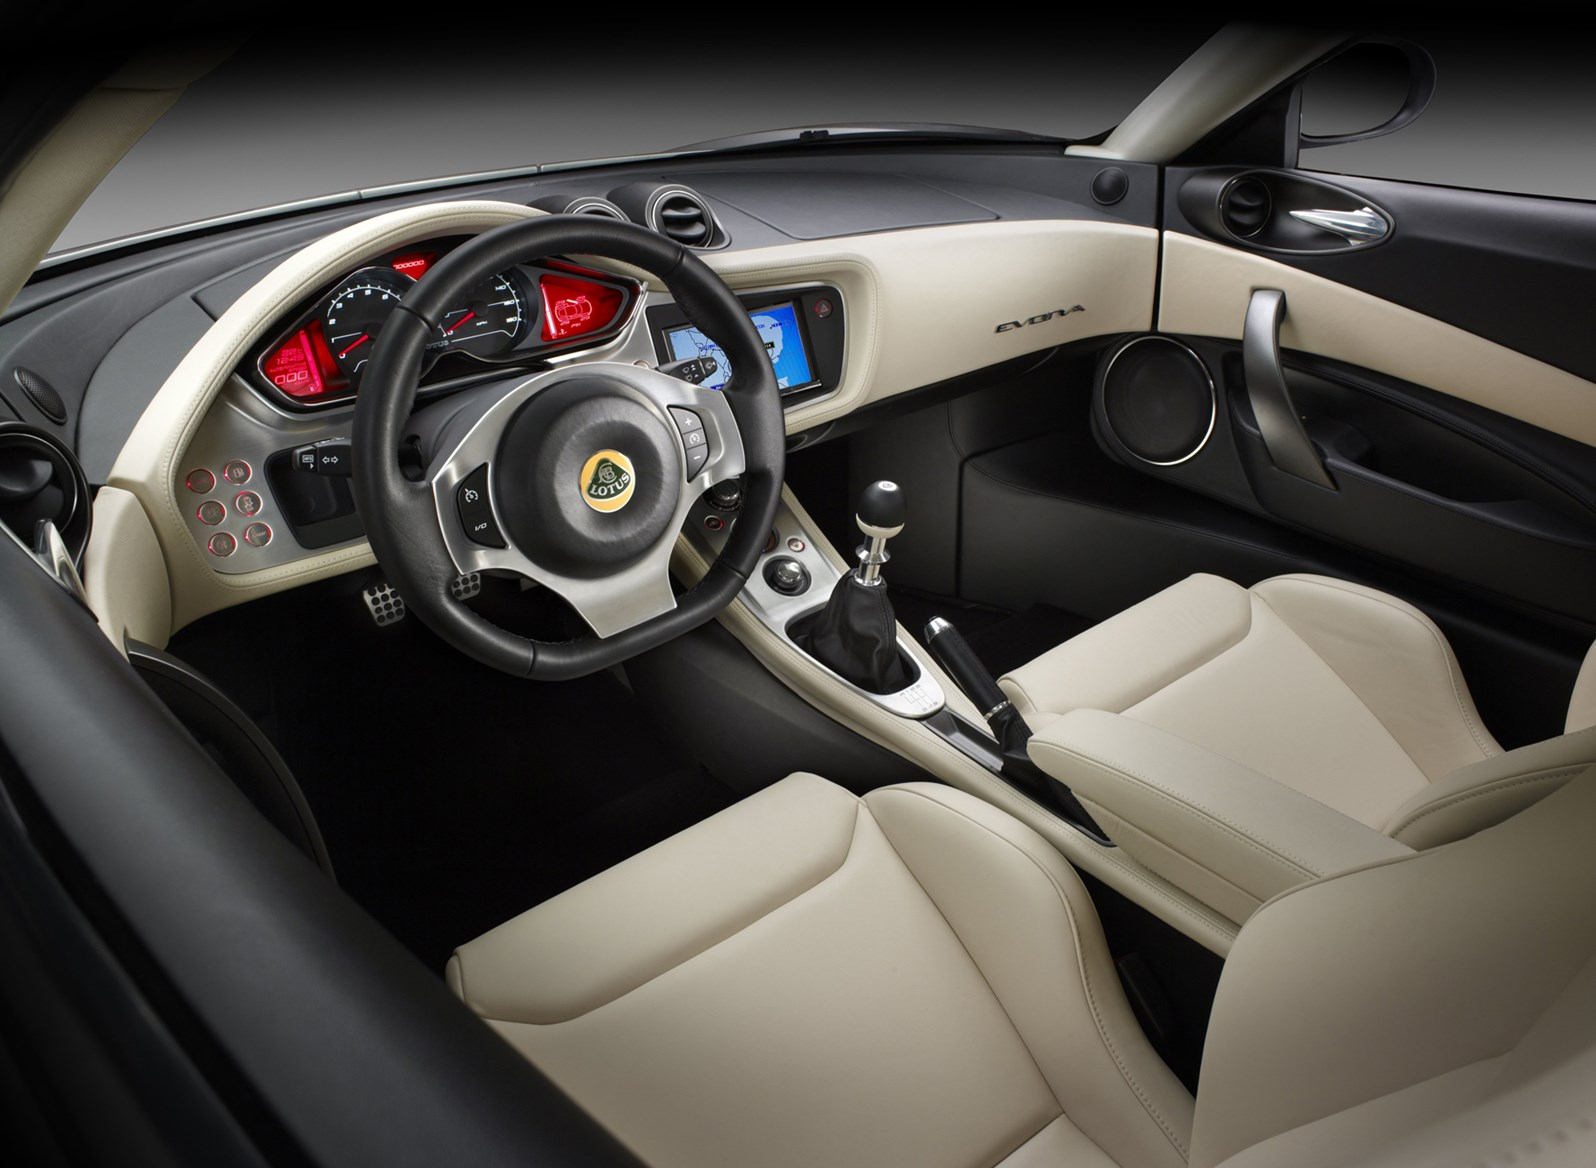 Lotus Evora Coupe Review 2009 Parkers